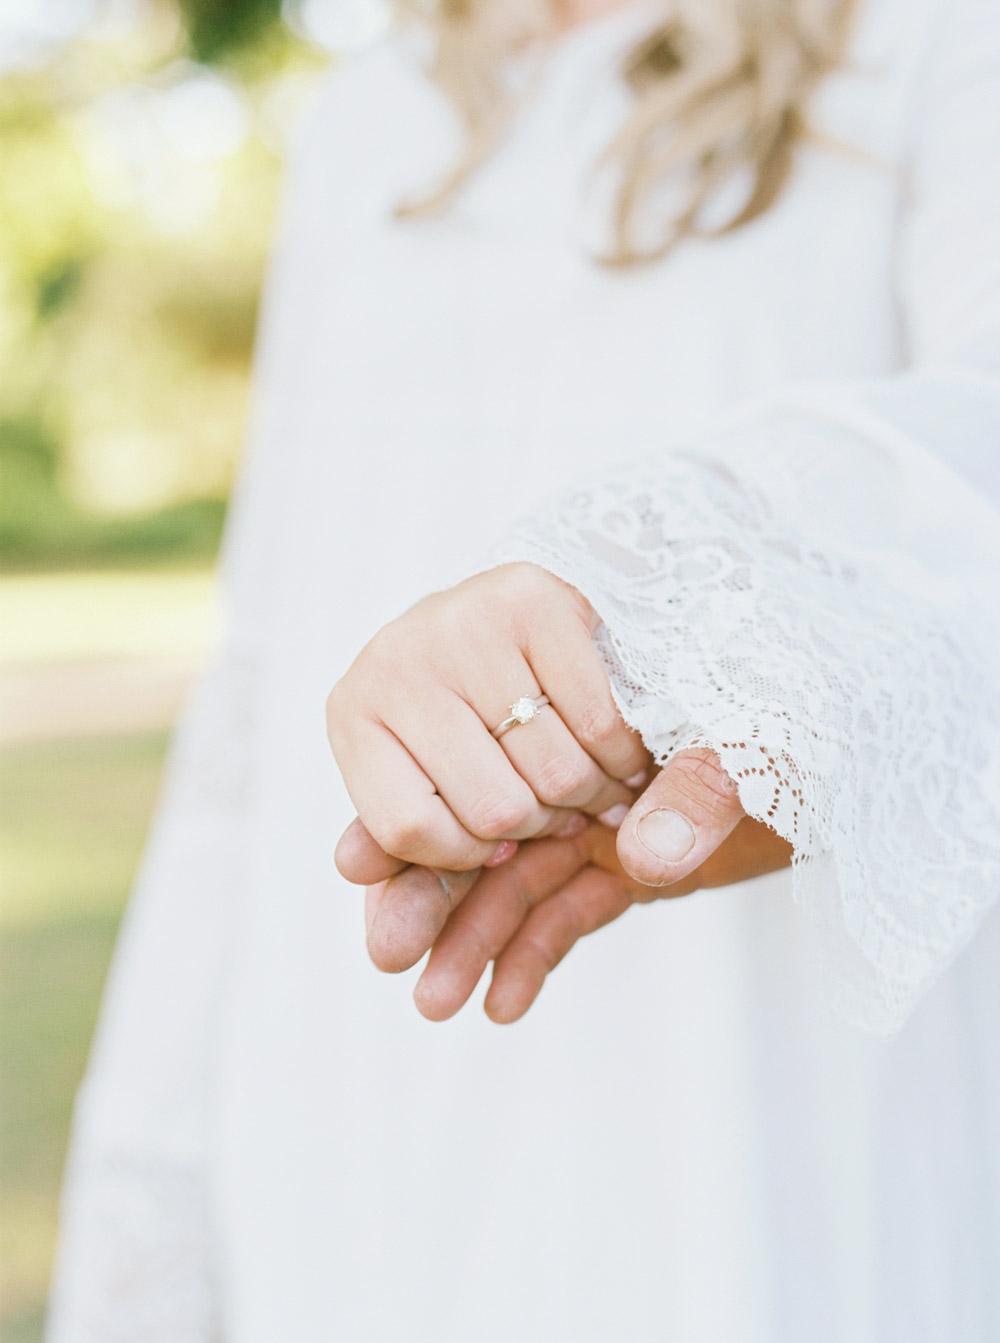 Australia NSW Wedding Photographer -- Park Engagement Photos -- Wedding Blog - The Overwhelmed Bride